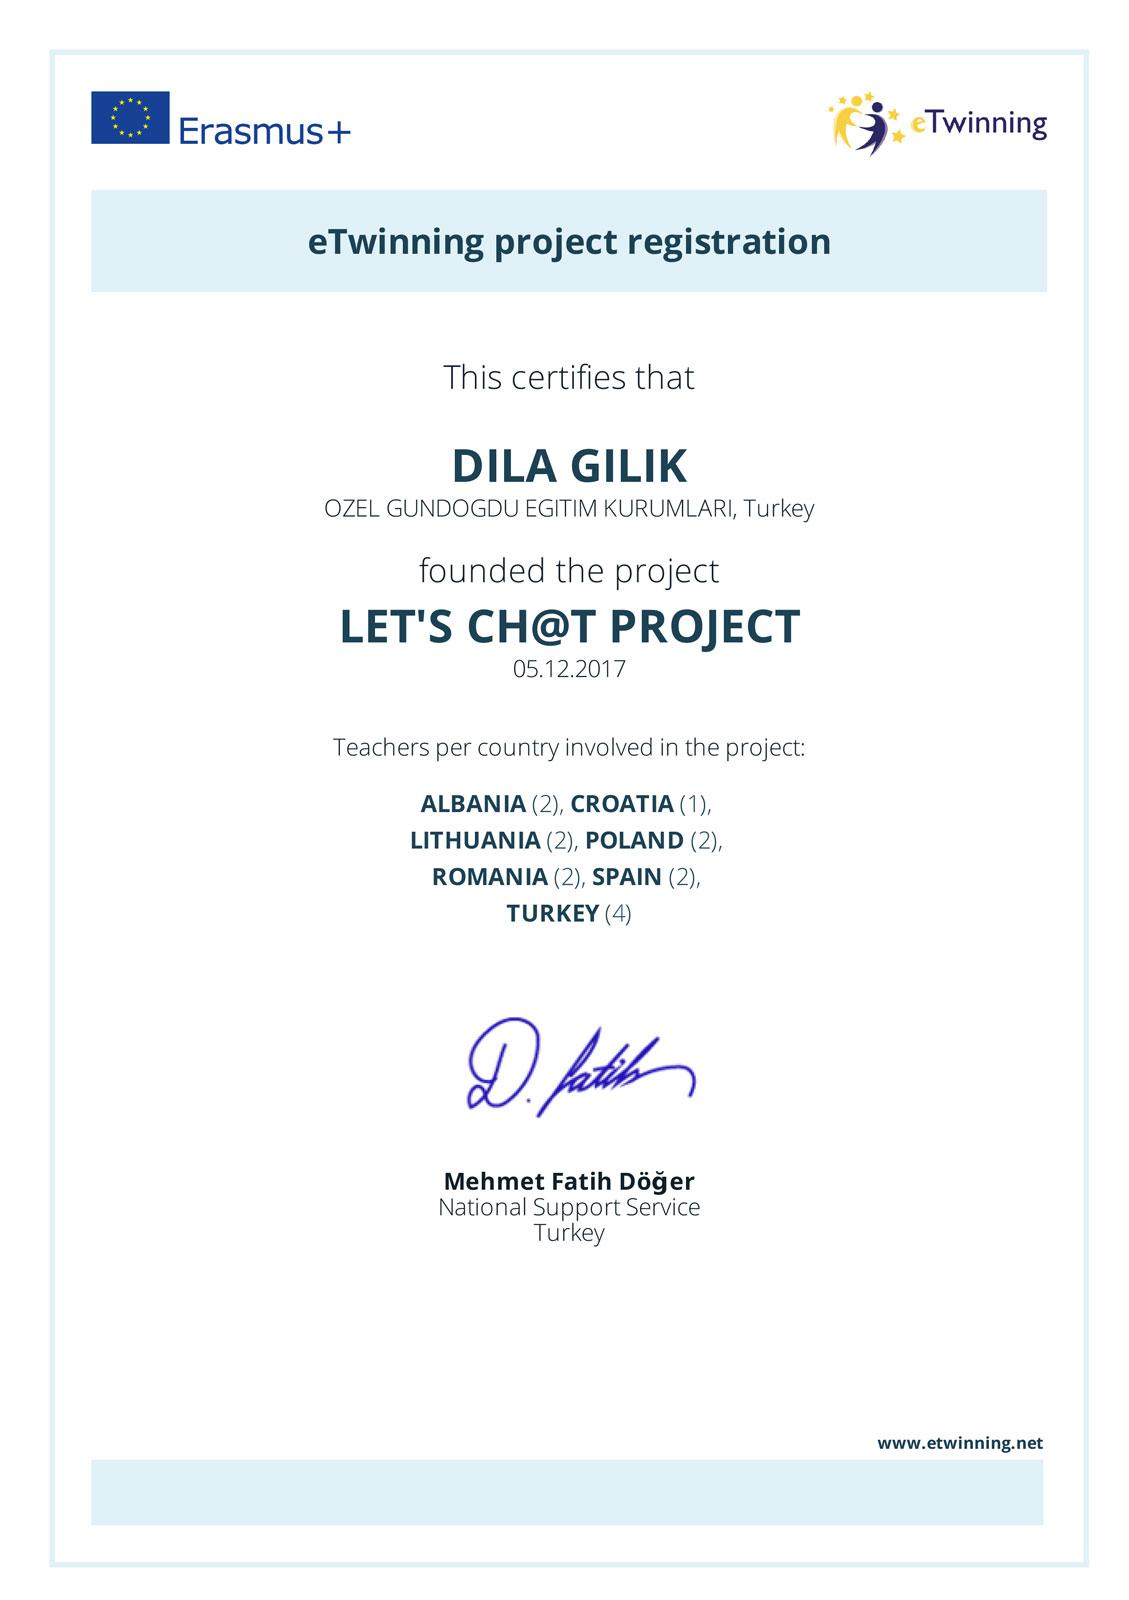 Lets-chat-project-proje-sertifikasi